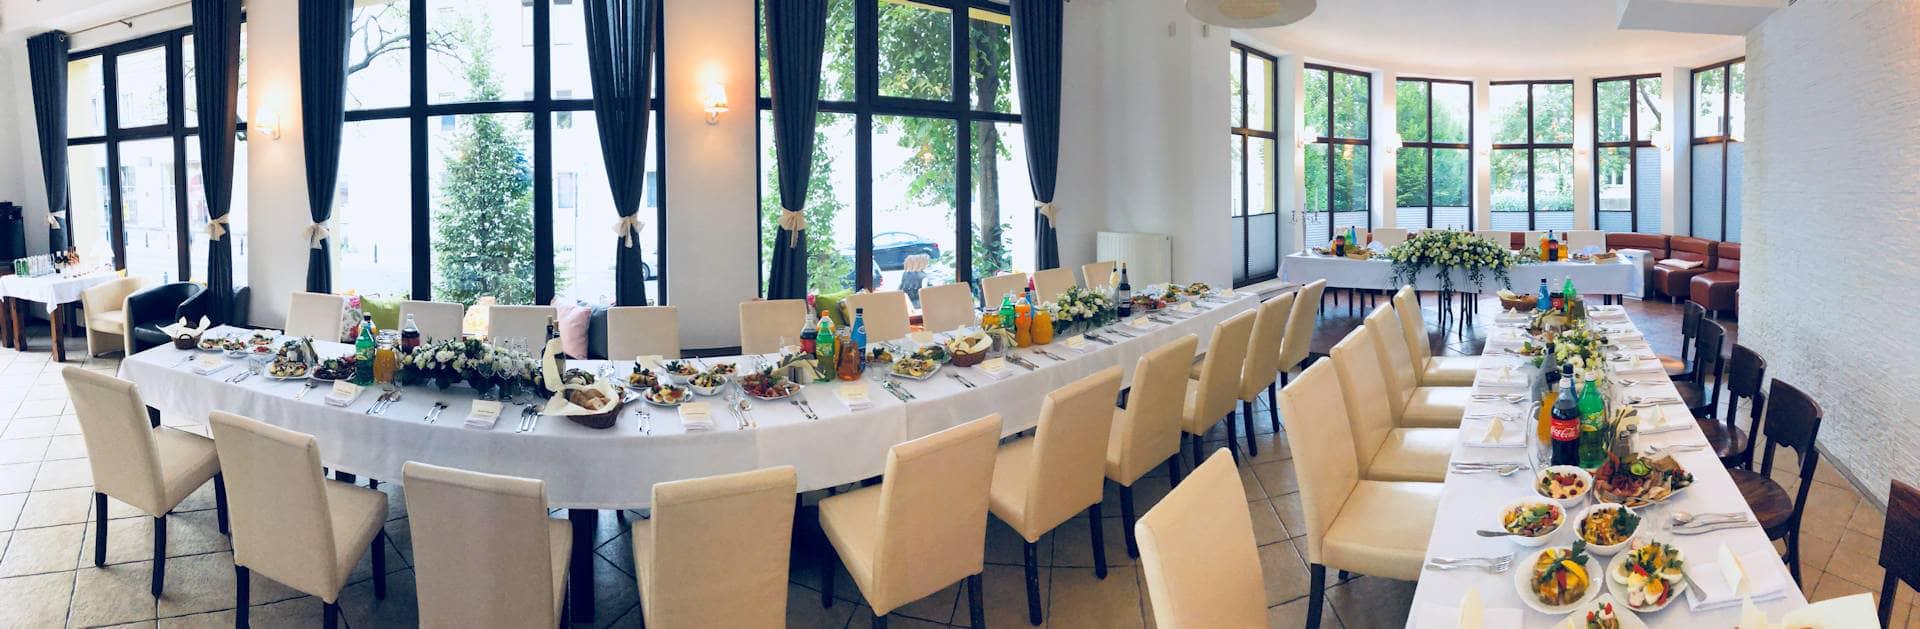 ogrod-smaku-restauracja-1img (1)